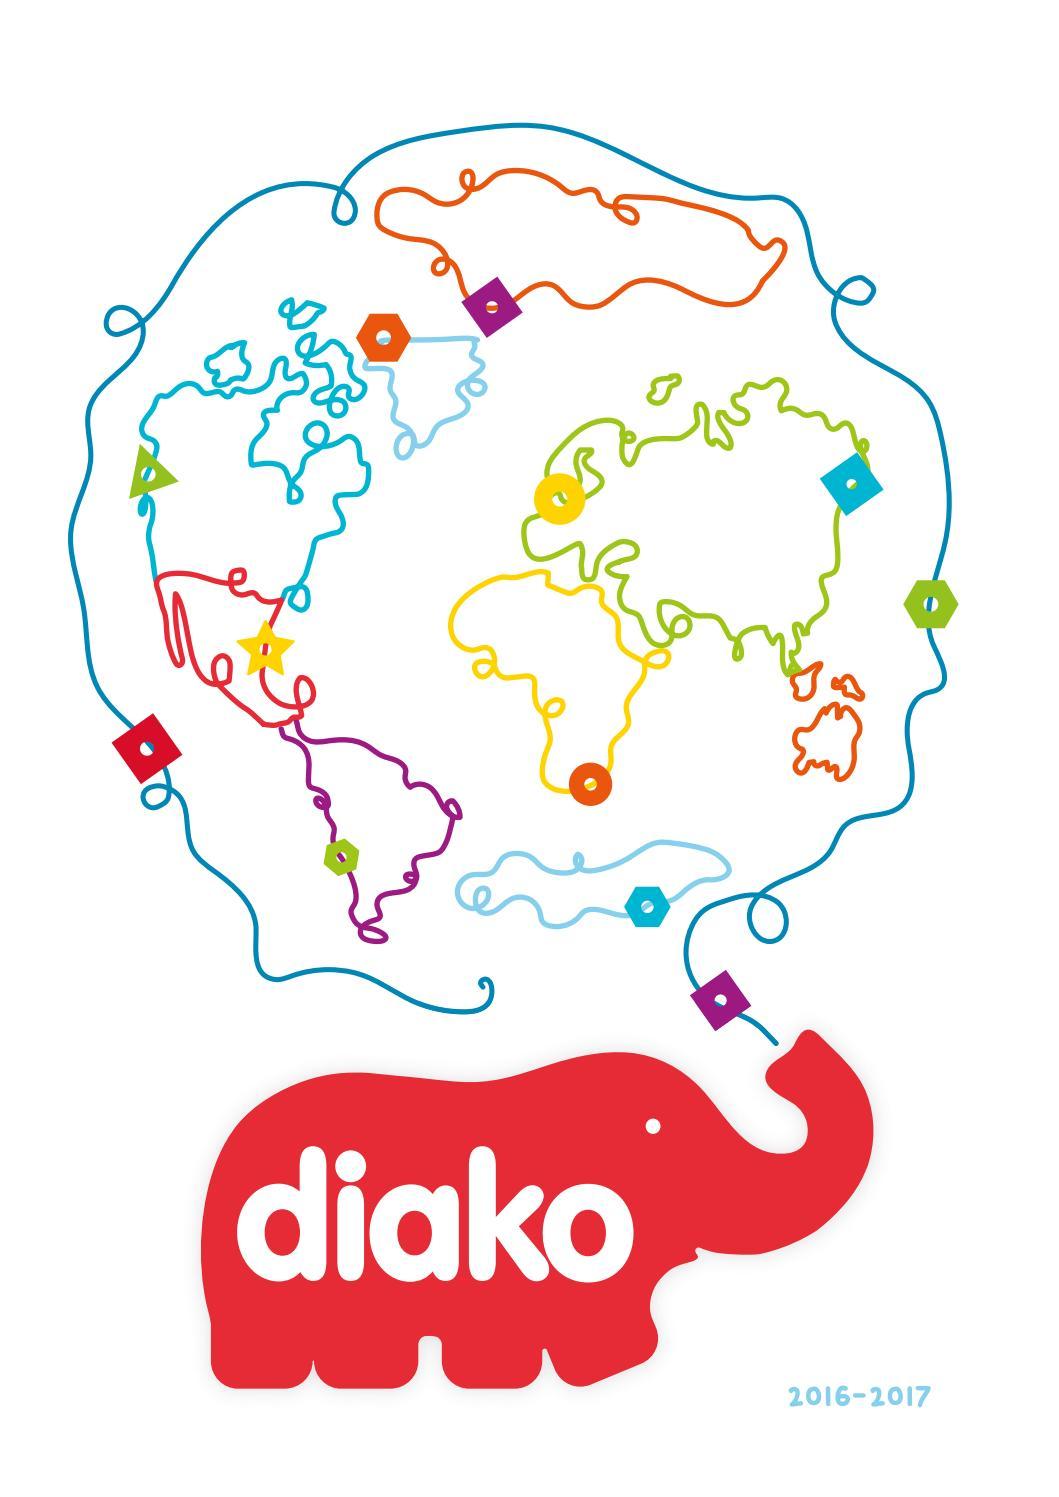 Catálogos Diako Abc 2016-2017 by Diako Abc - issuu